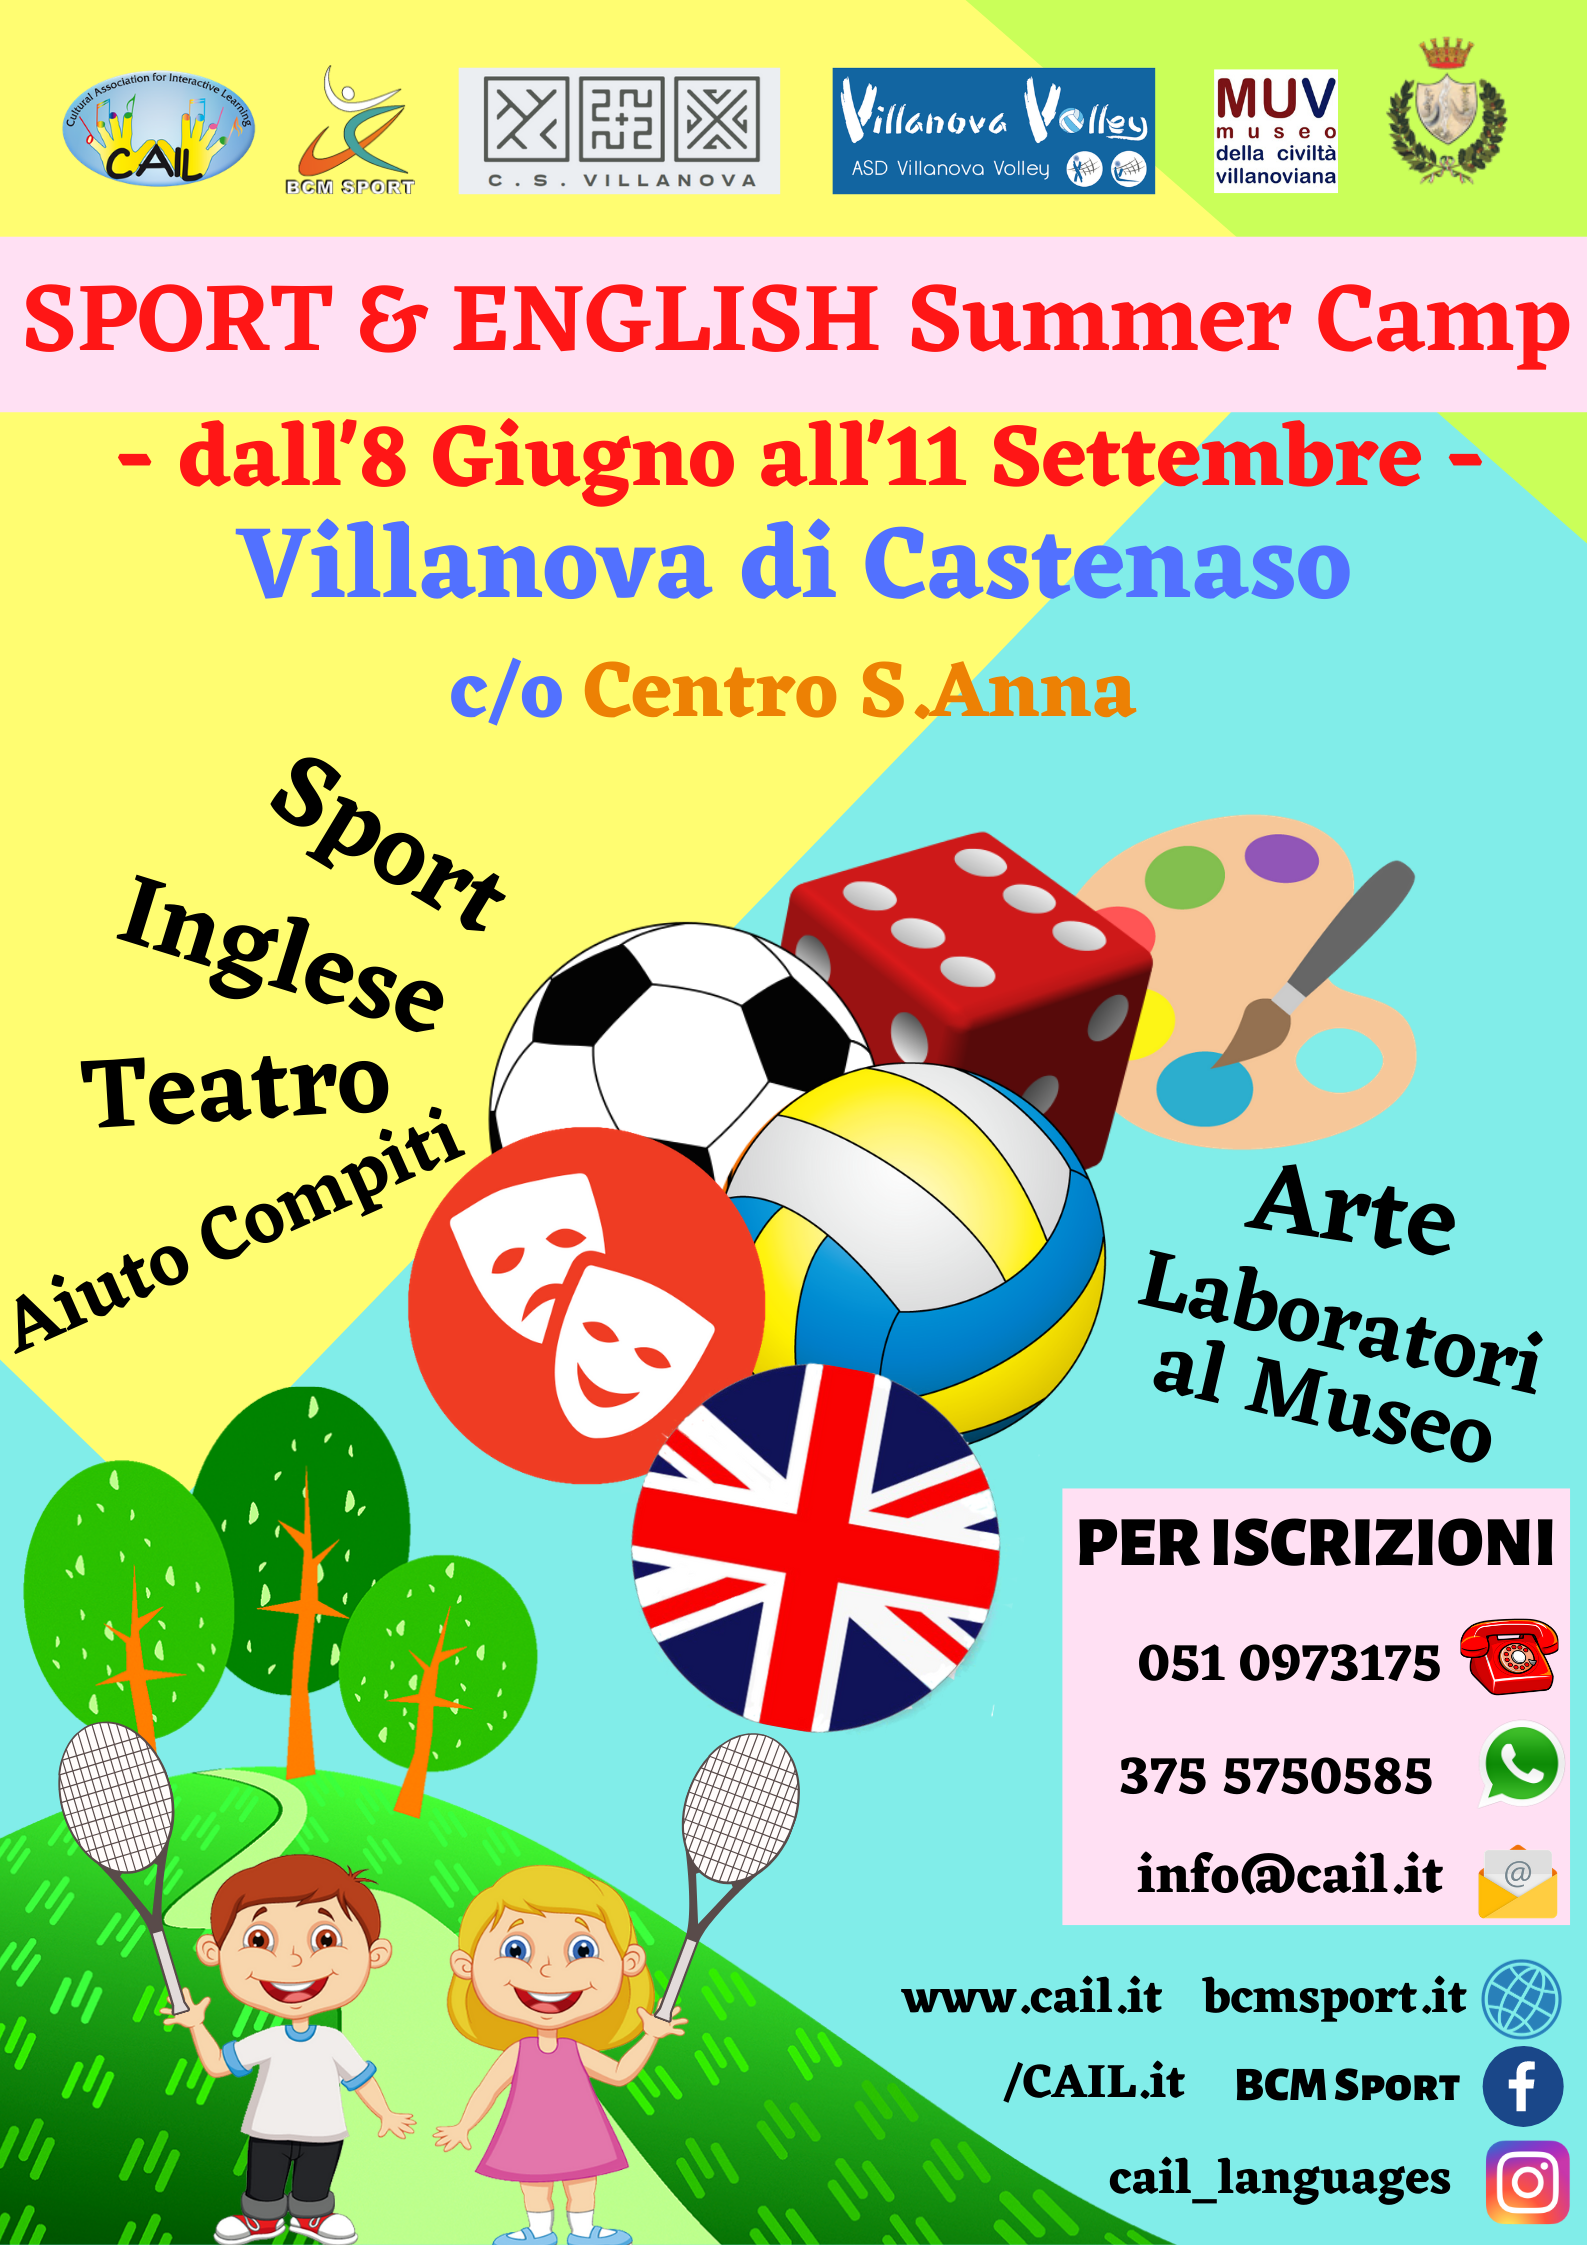 Locandina-Sport-English-Summer-Camp-Villanova-2020